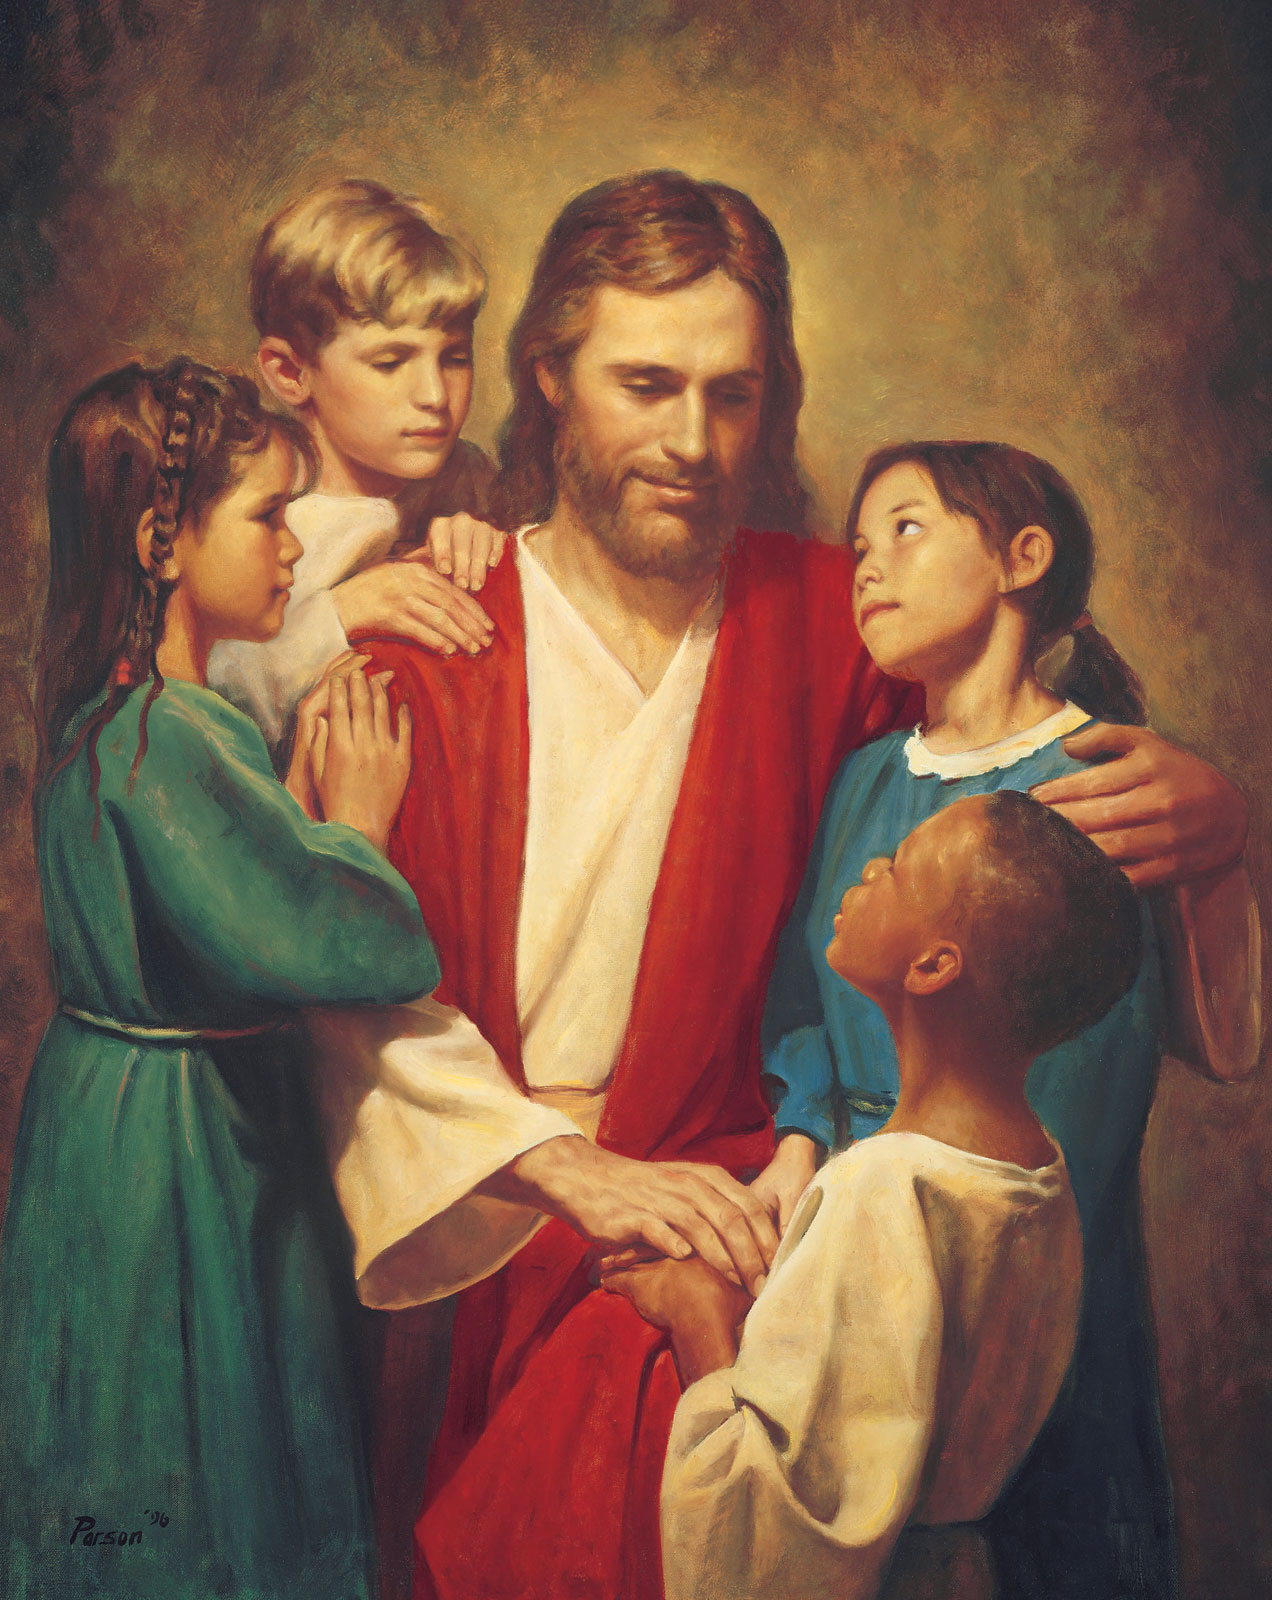 La prostituta de purpura y escarlata Jesus-children-37775-wallpaper